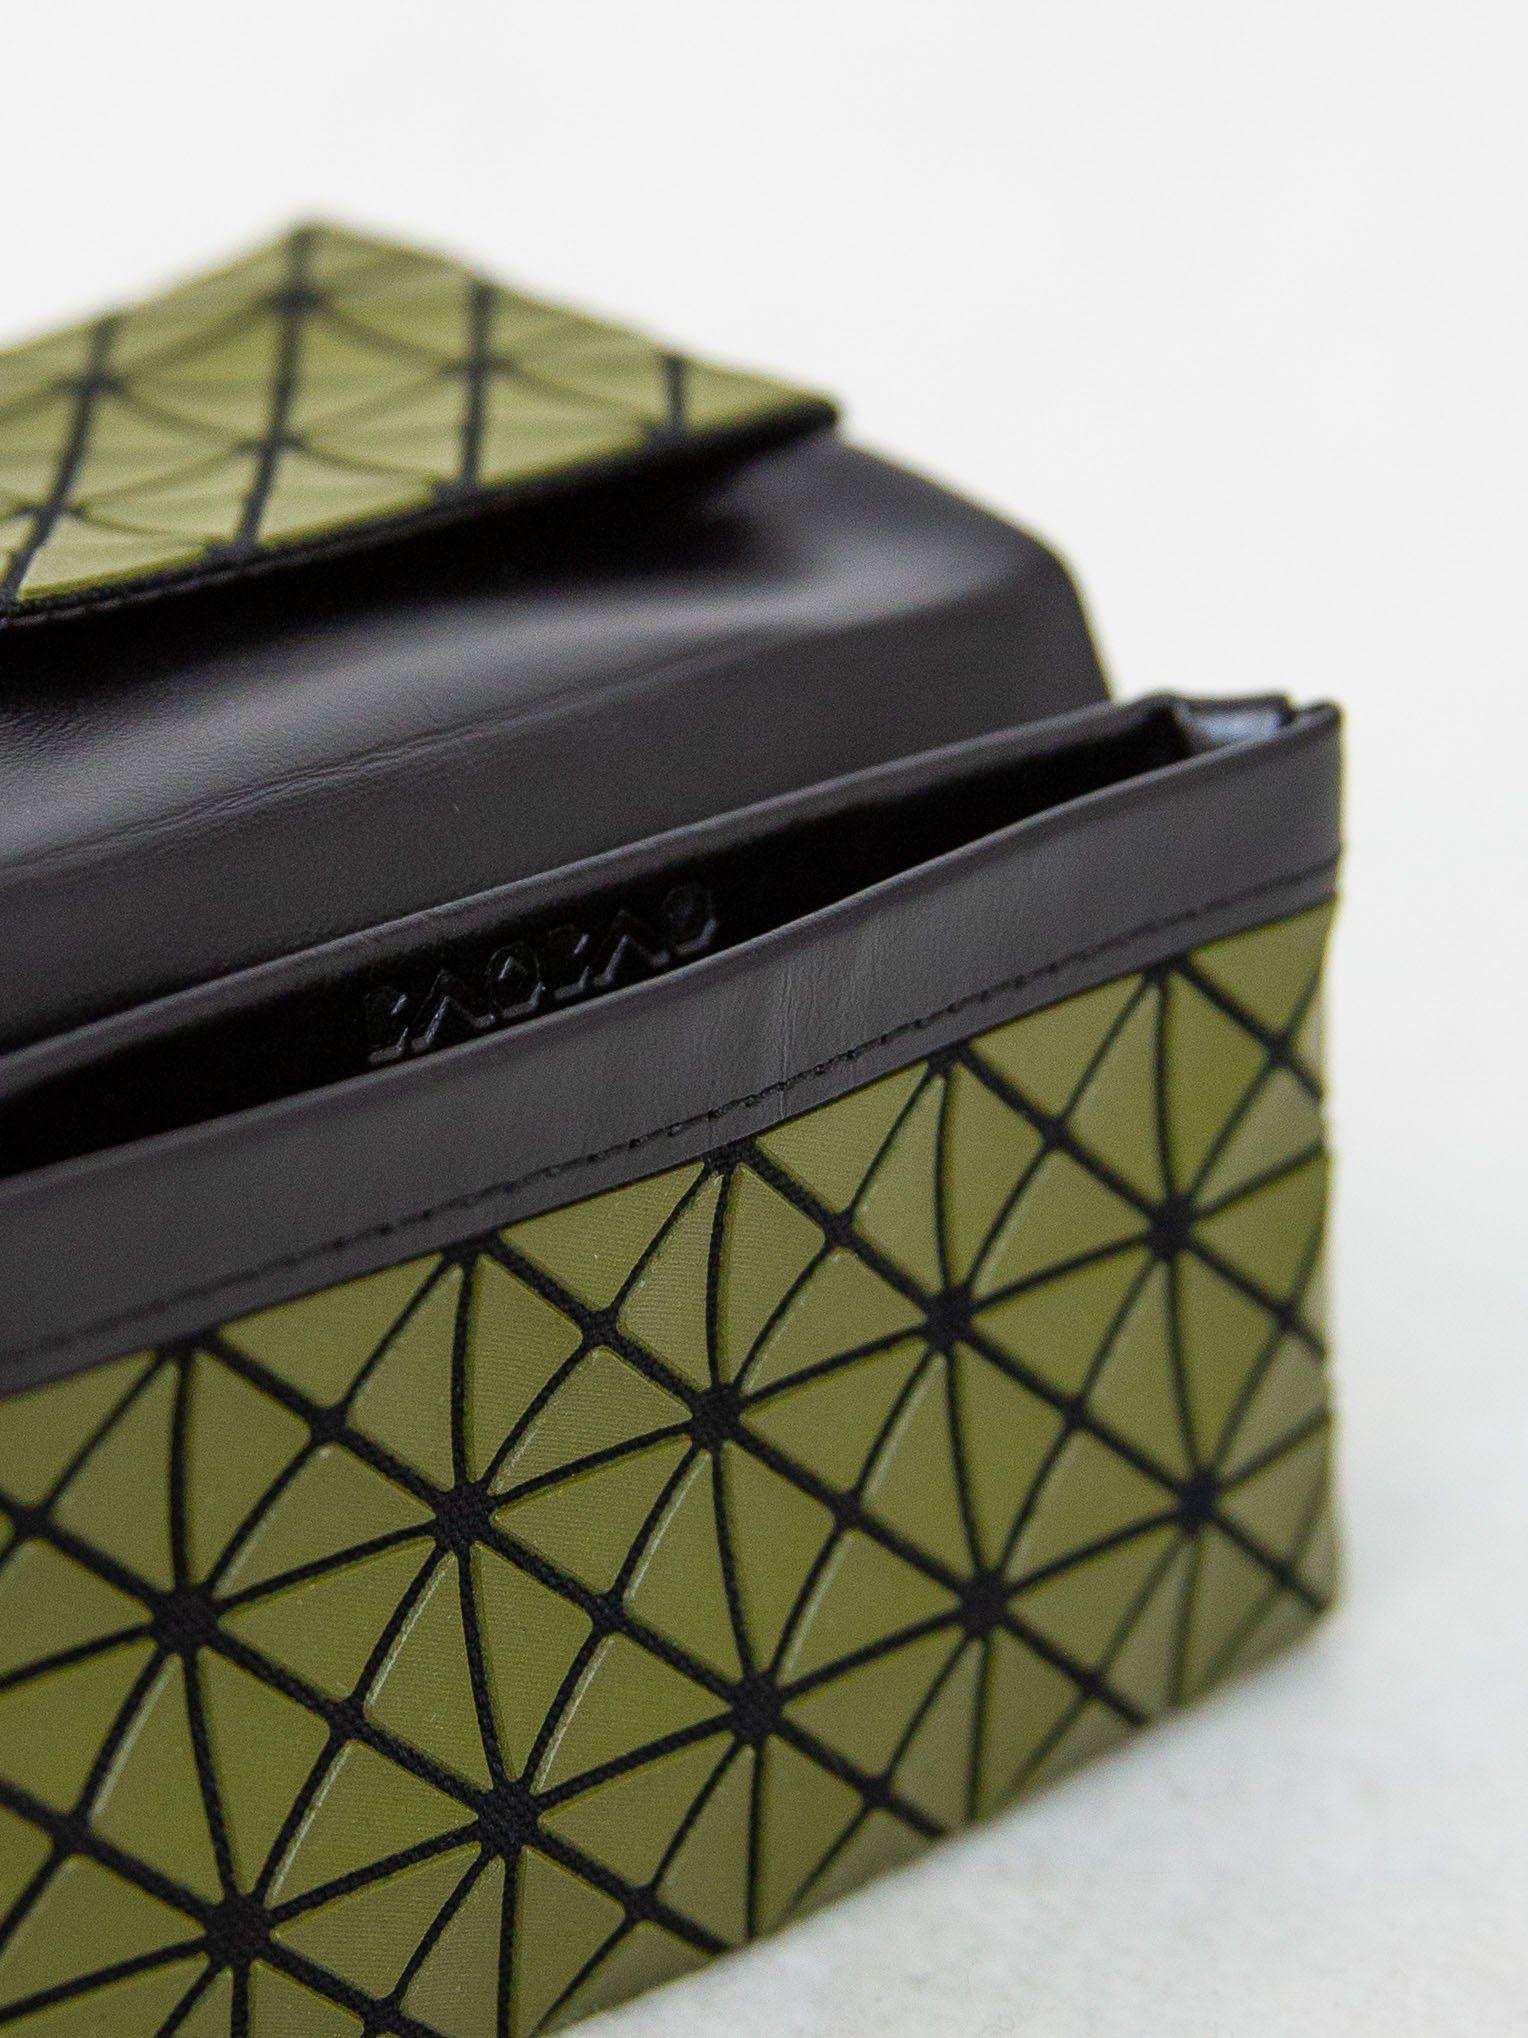 BAO BAO ISSEY MIYAKE Oyster Card Holder - Khaki  f3cfb04934c48